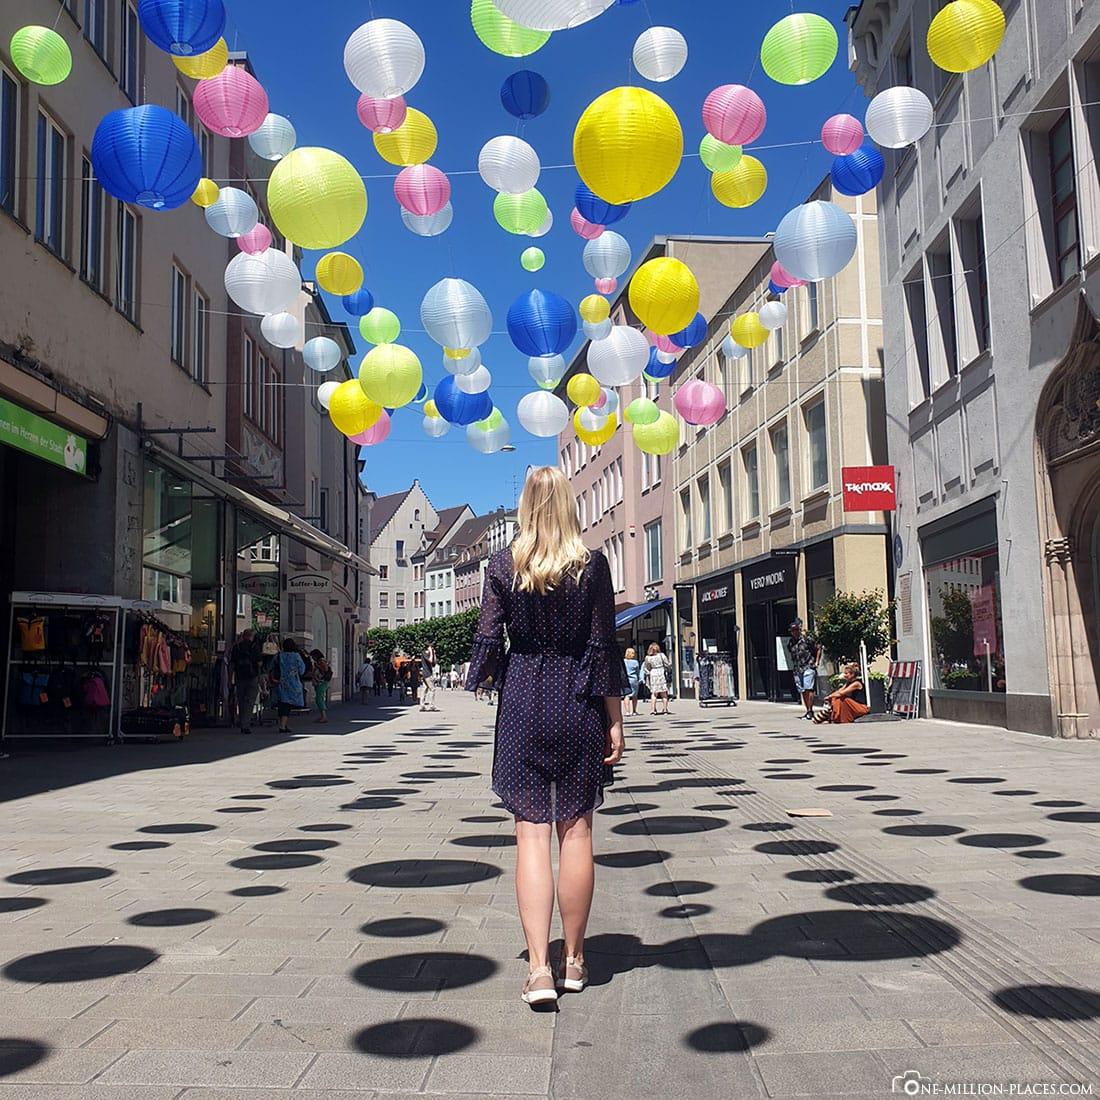 Bunte Lampions, Augsburg, Fußgängerzone, Fotospot, Reisebericht